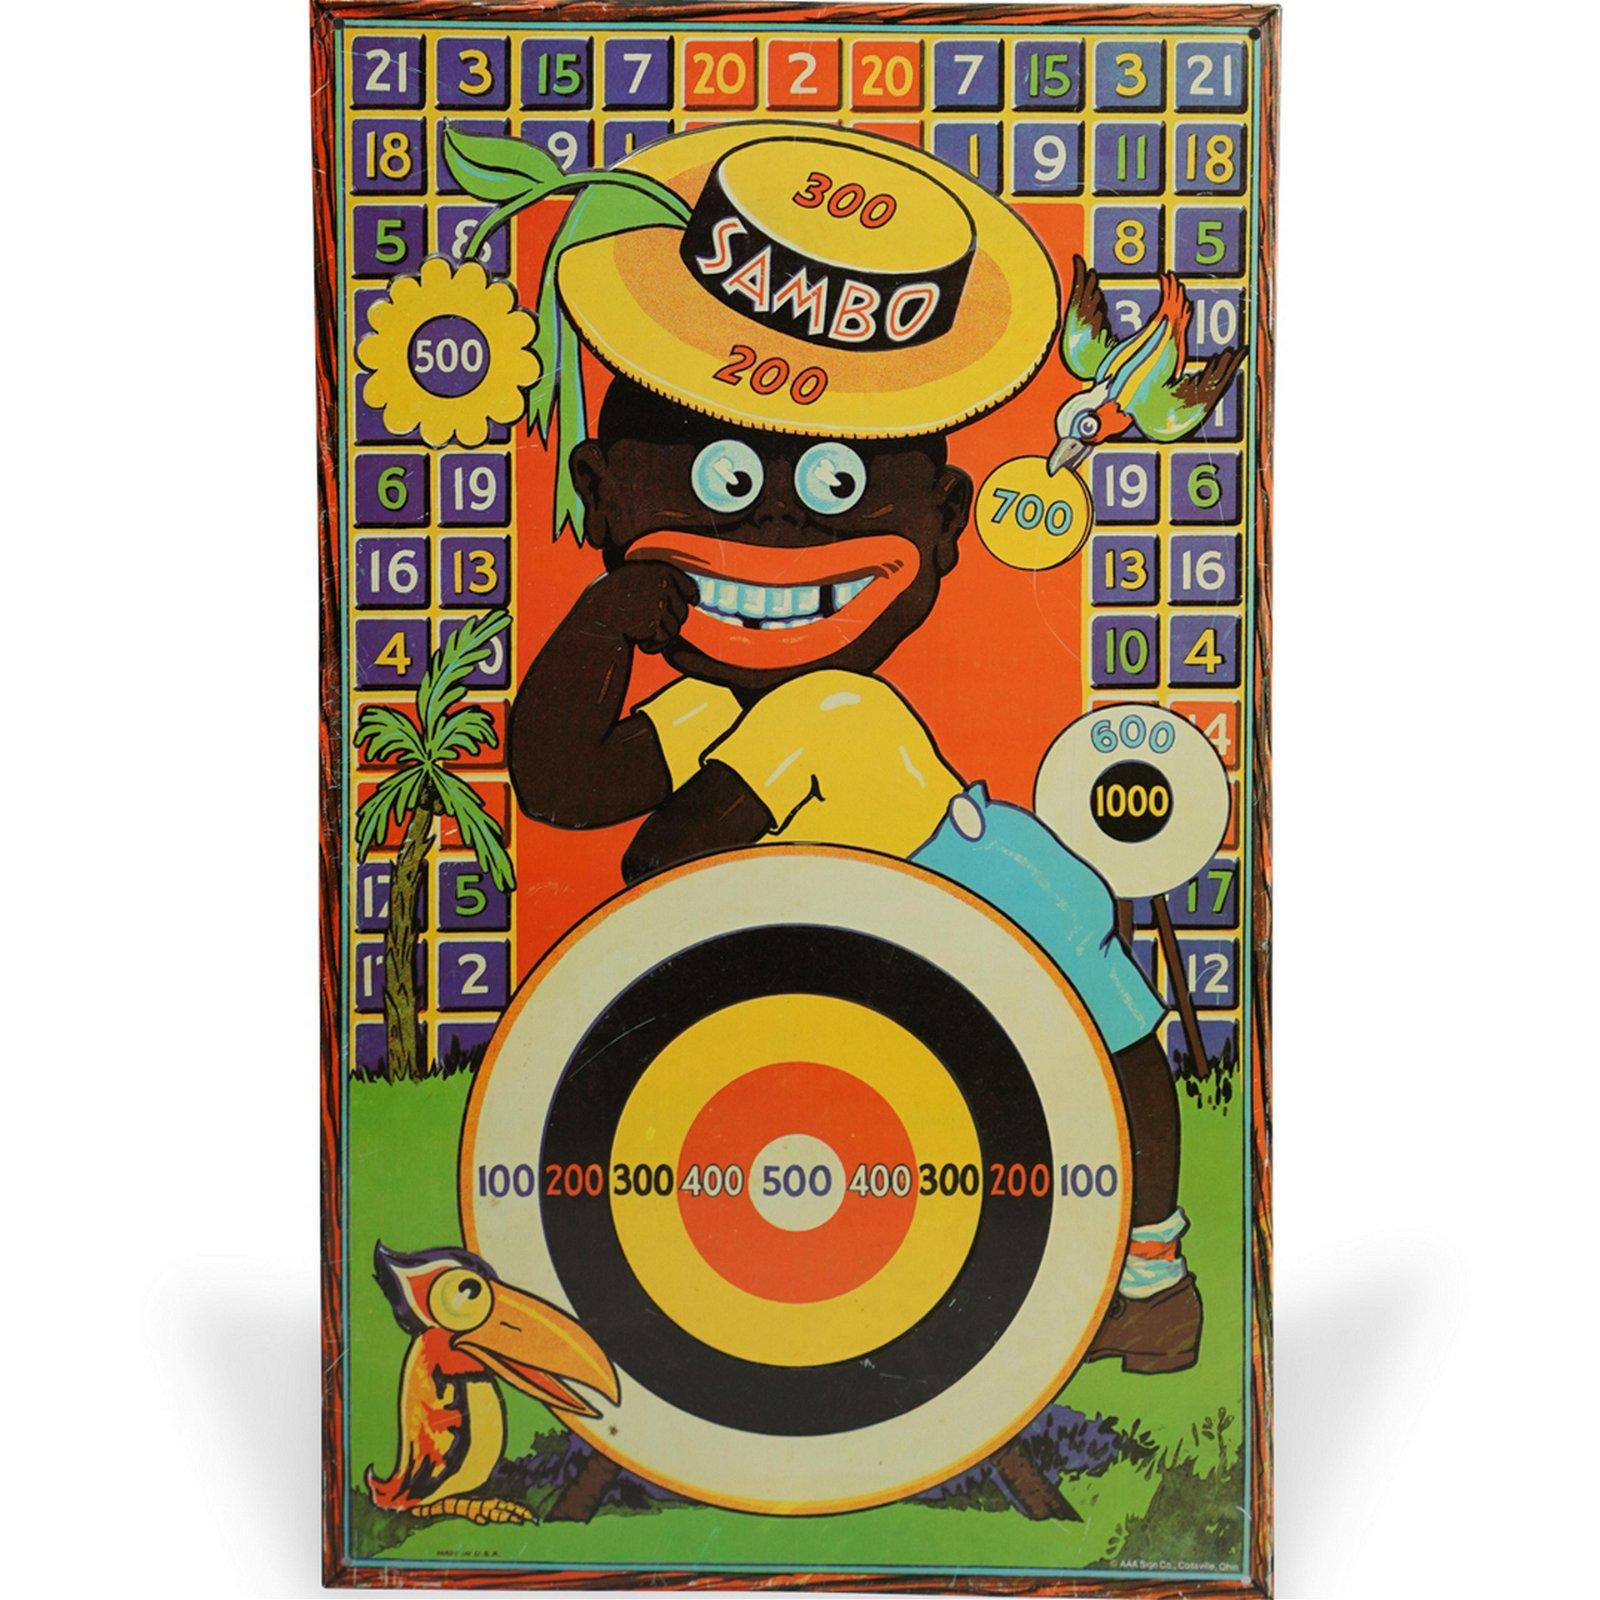 Antique Tin Black Americana Sambo Game Board